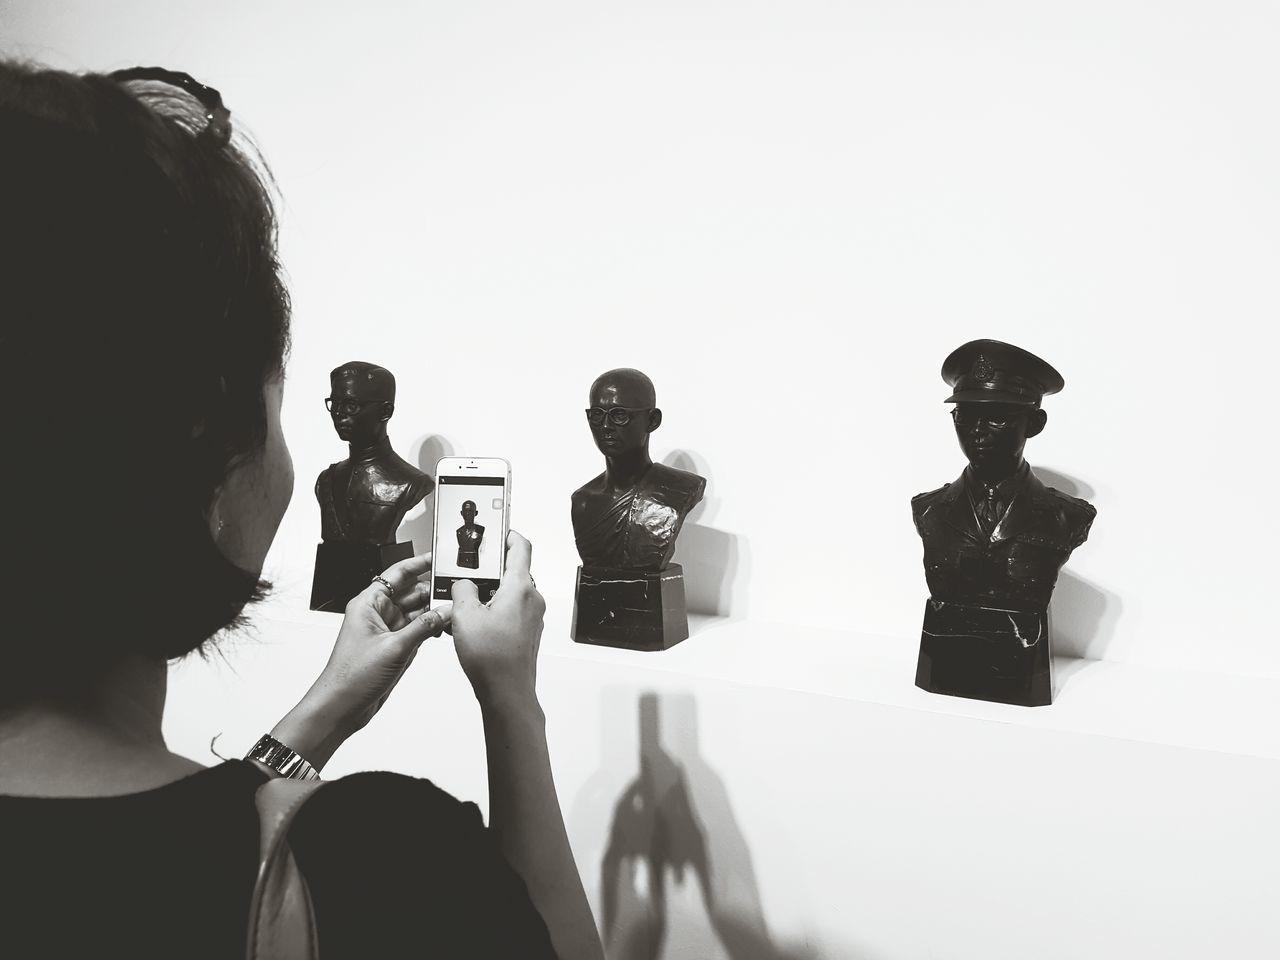 Documentary Thai Mourning Their Beloved King Ardel Gallery Of Modern Art Thailand Fineart Art Black And White Craft Thai Artist Artprint ArtWork King Of Thailand The Photojournalist - 2017 EyeEm Awards